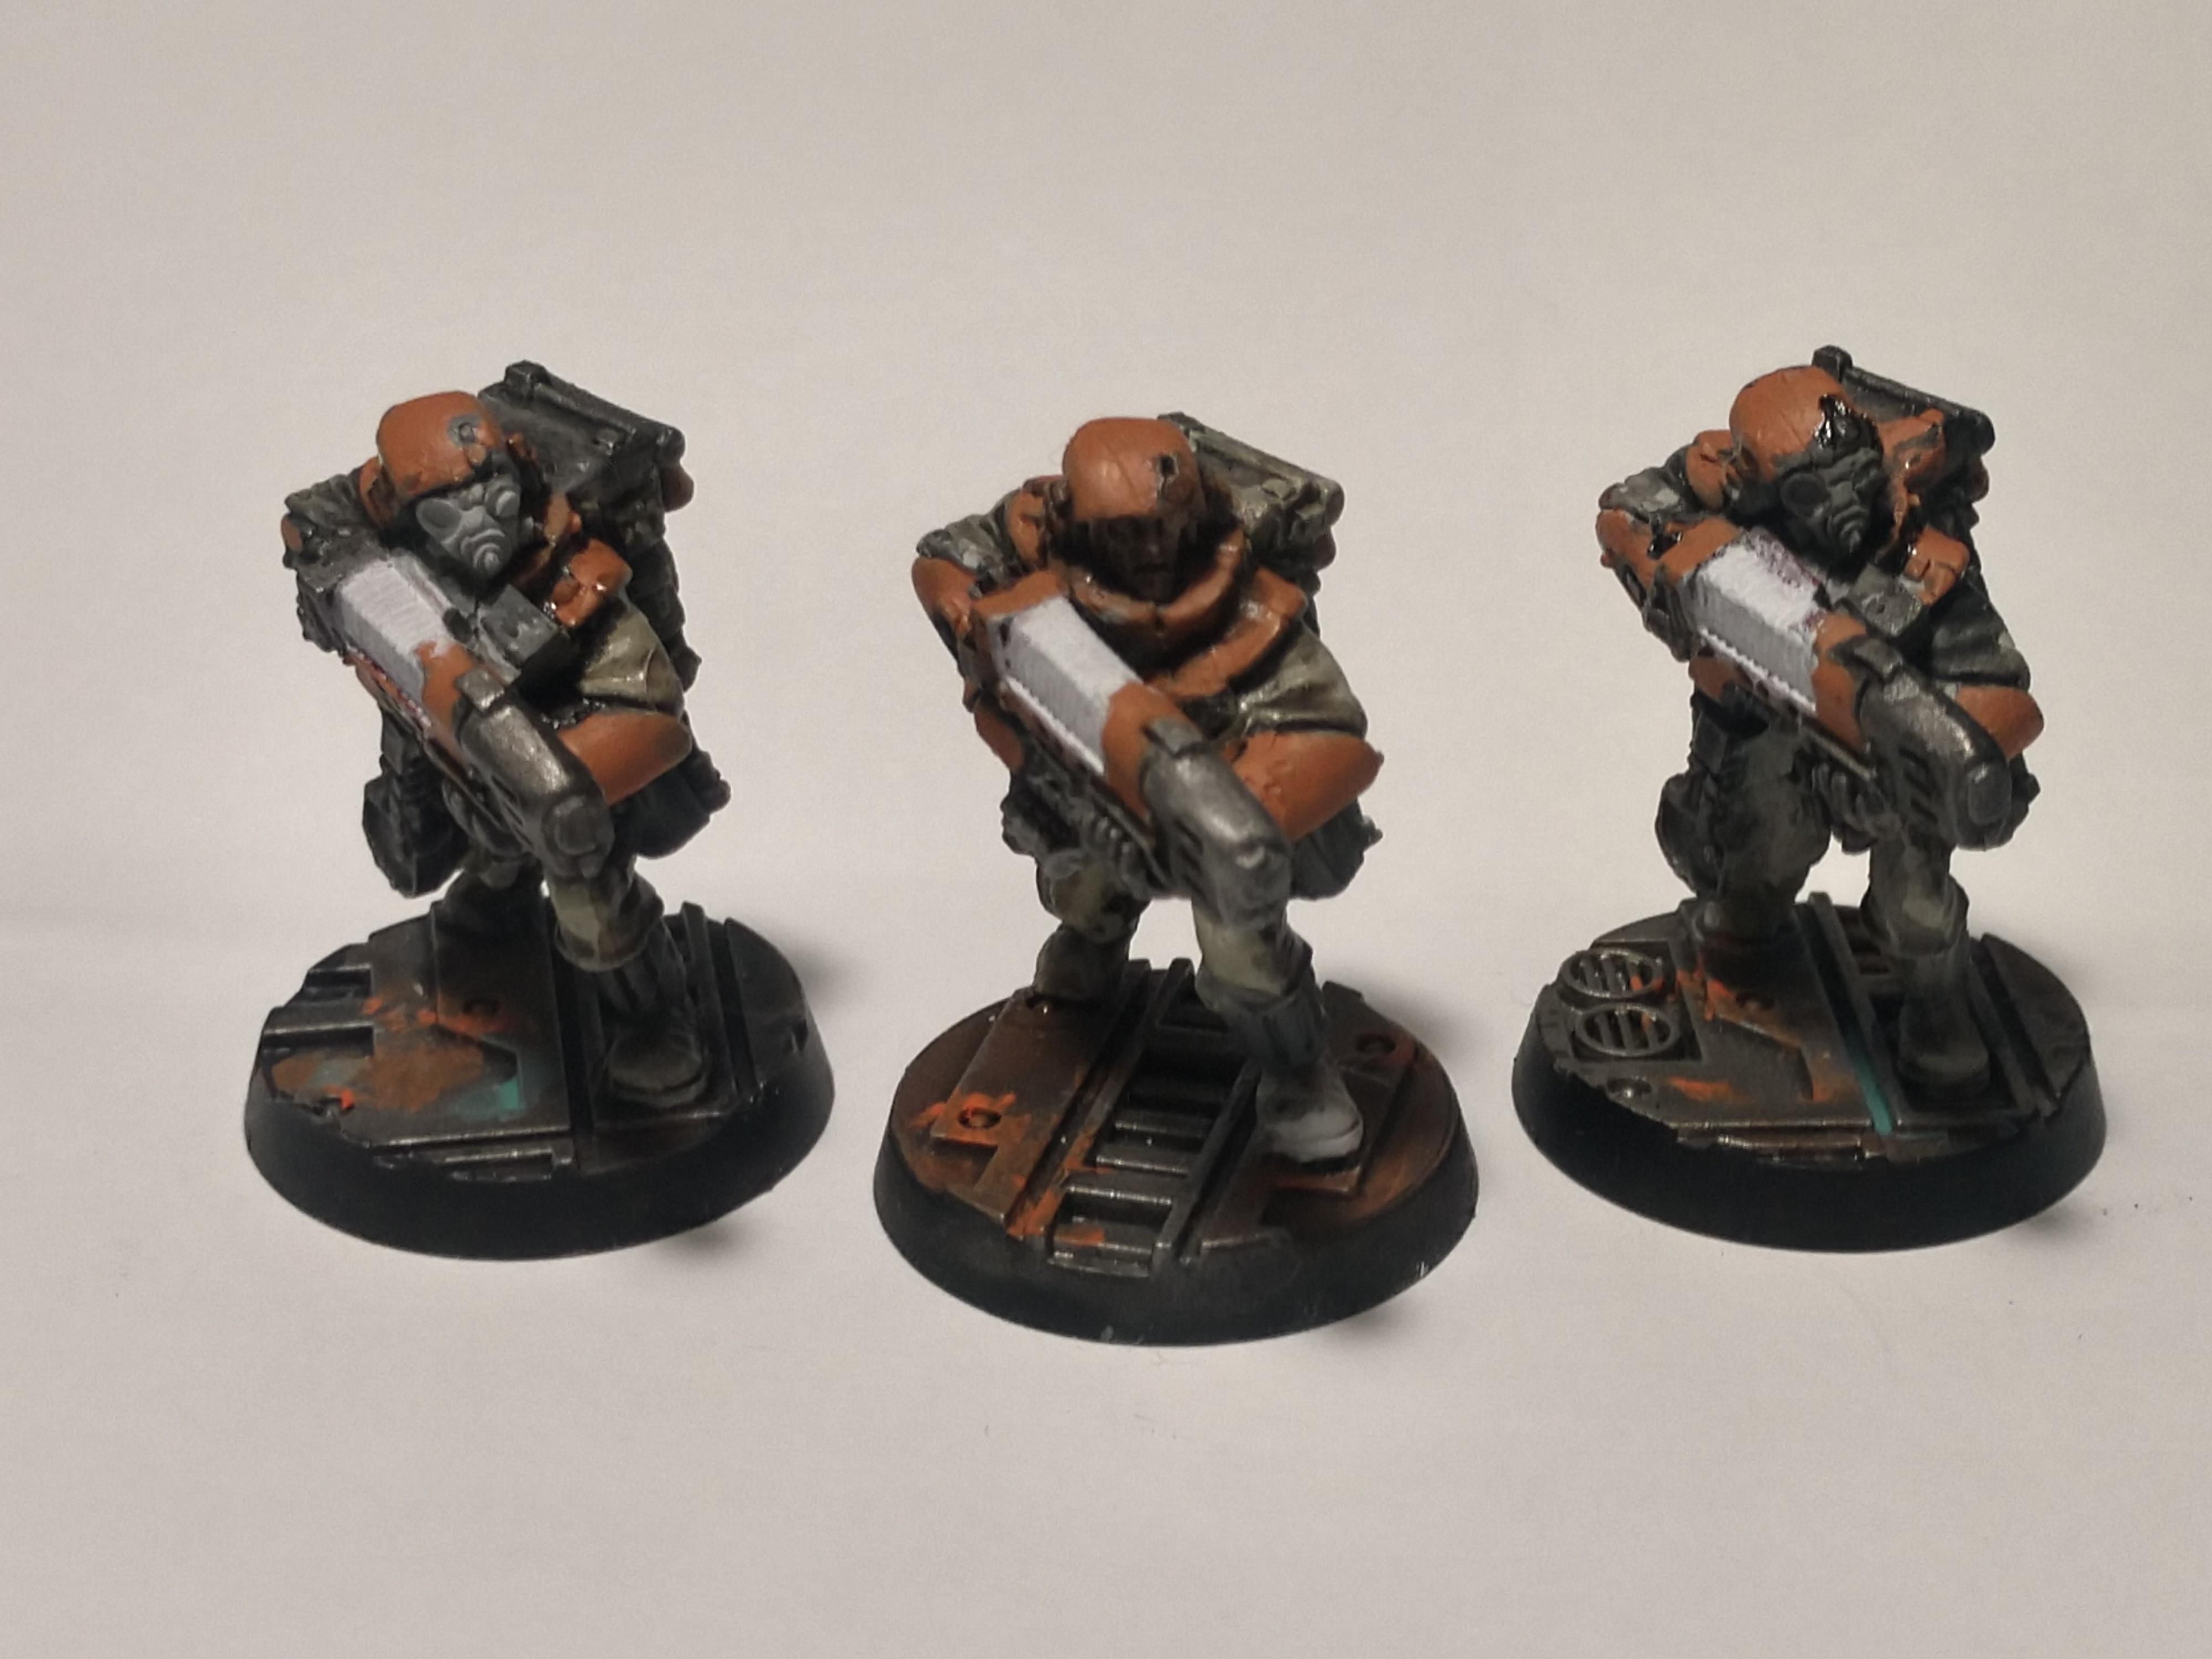 Astra Militarum, Imperial Guard, Orange, Plasma, Storm Troopers, Tempestus Scions, Warhammer 40,000